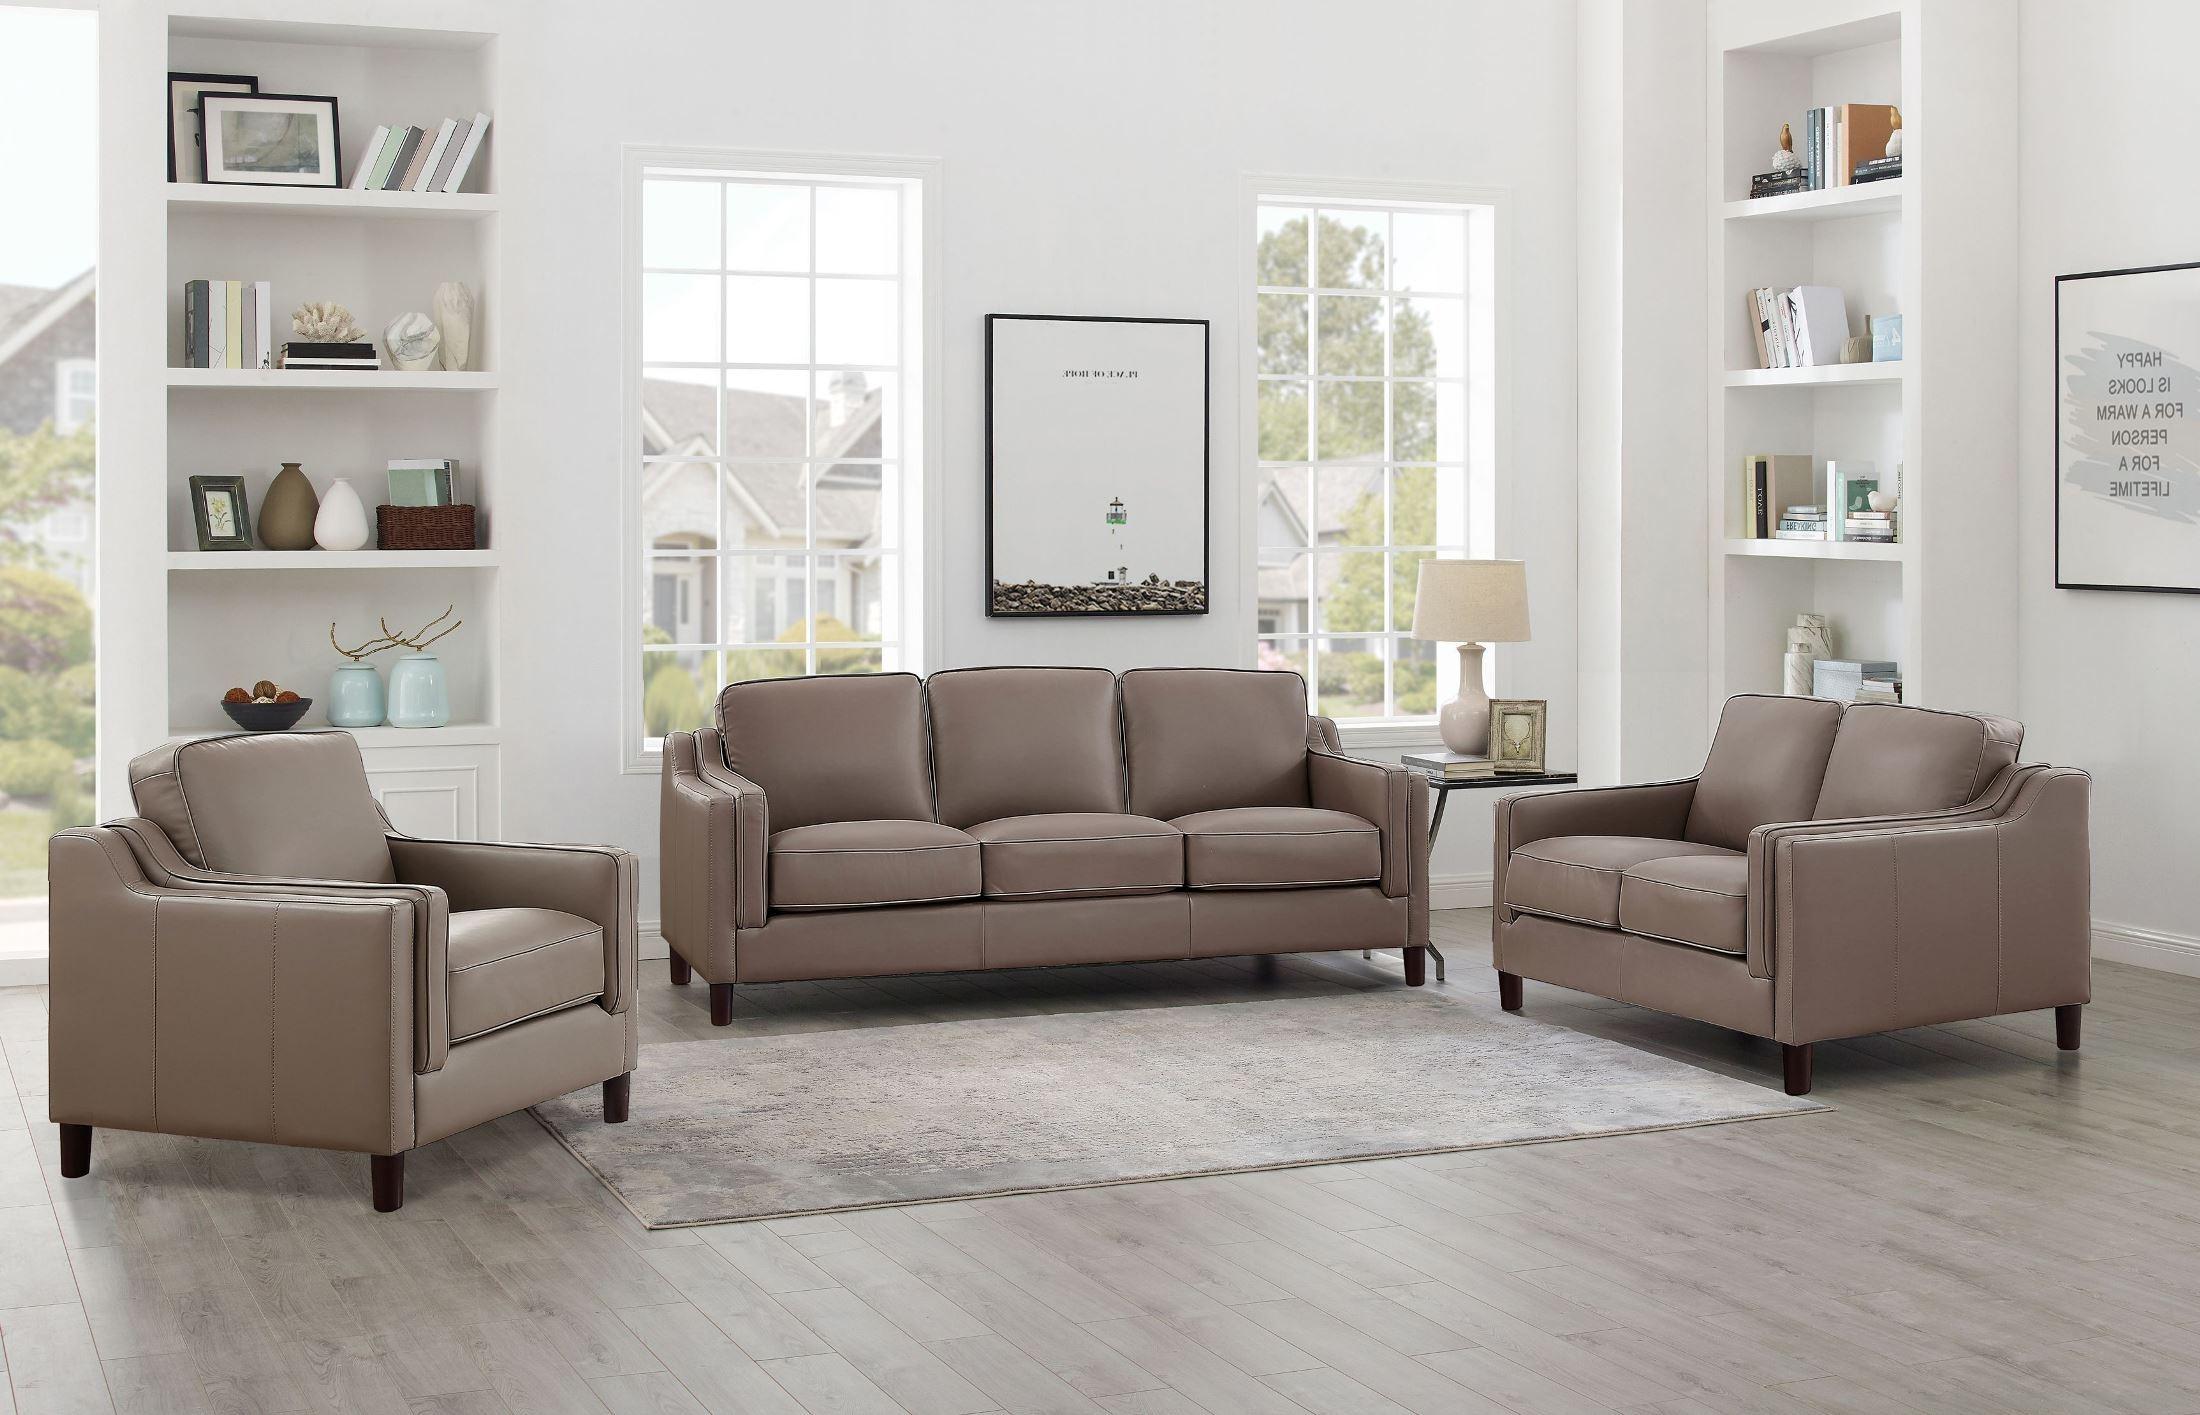 hydeline richard taupe top grain leather living room set